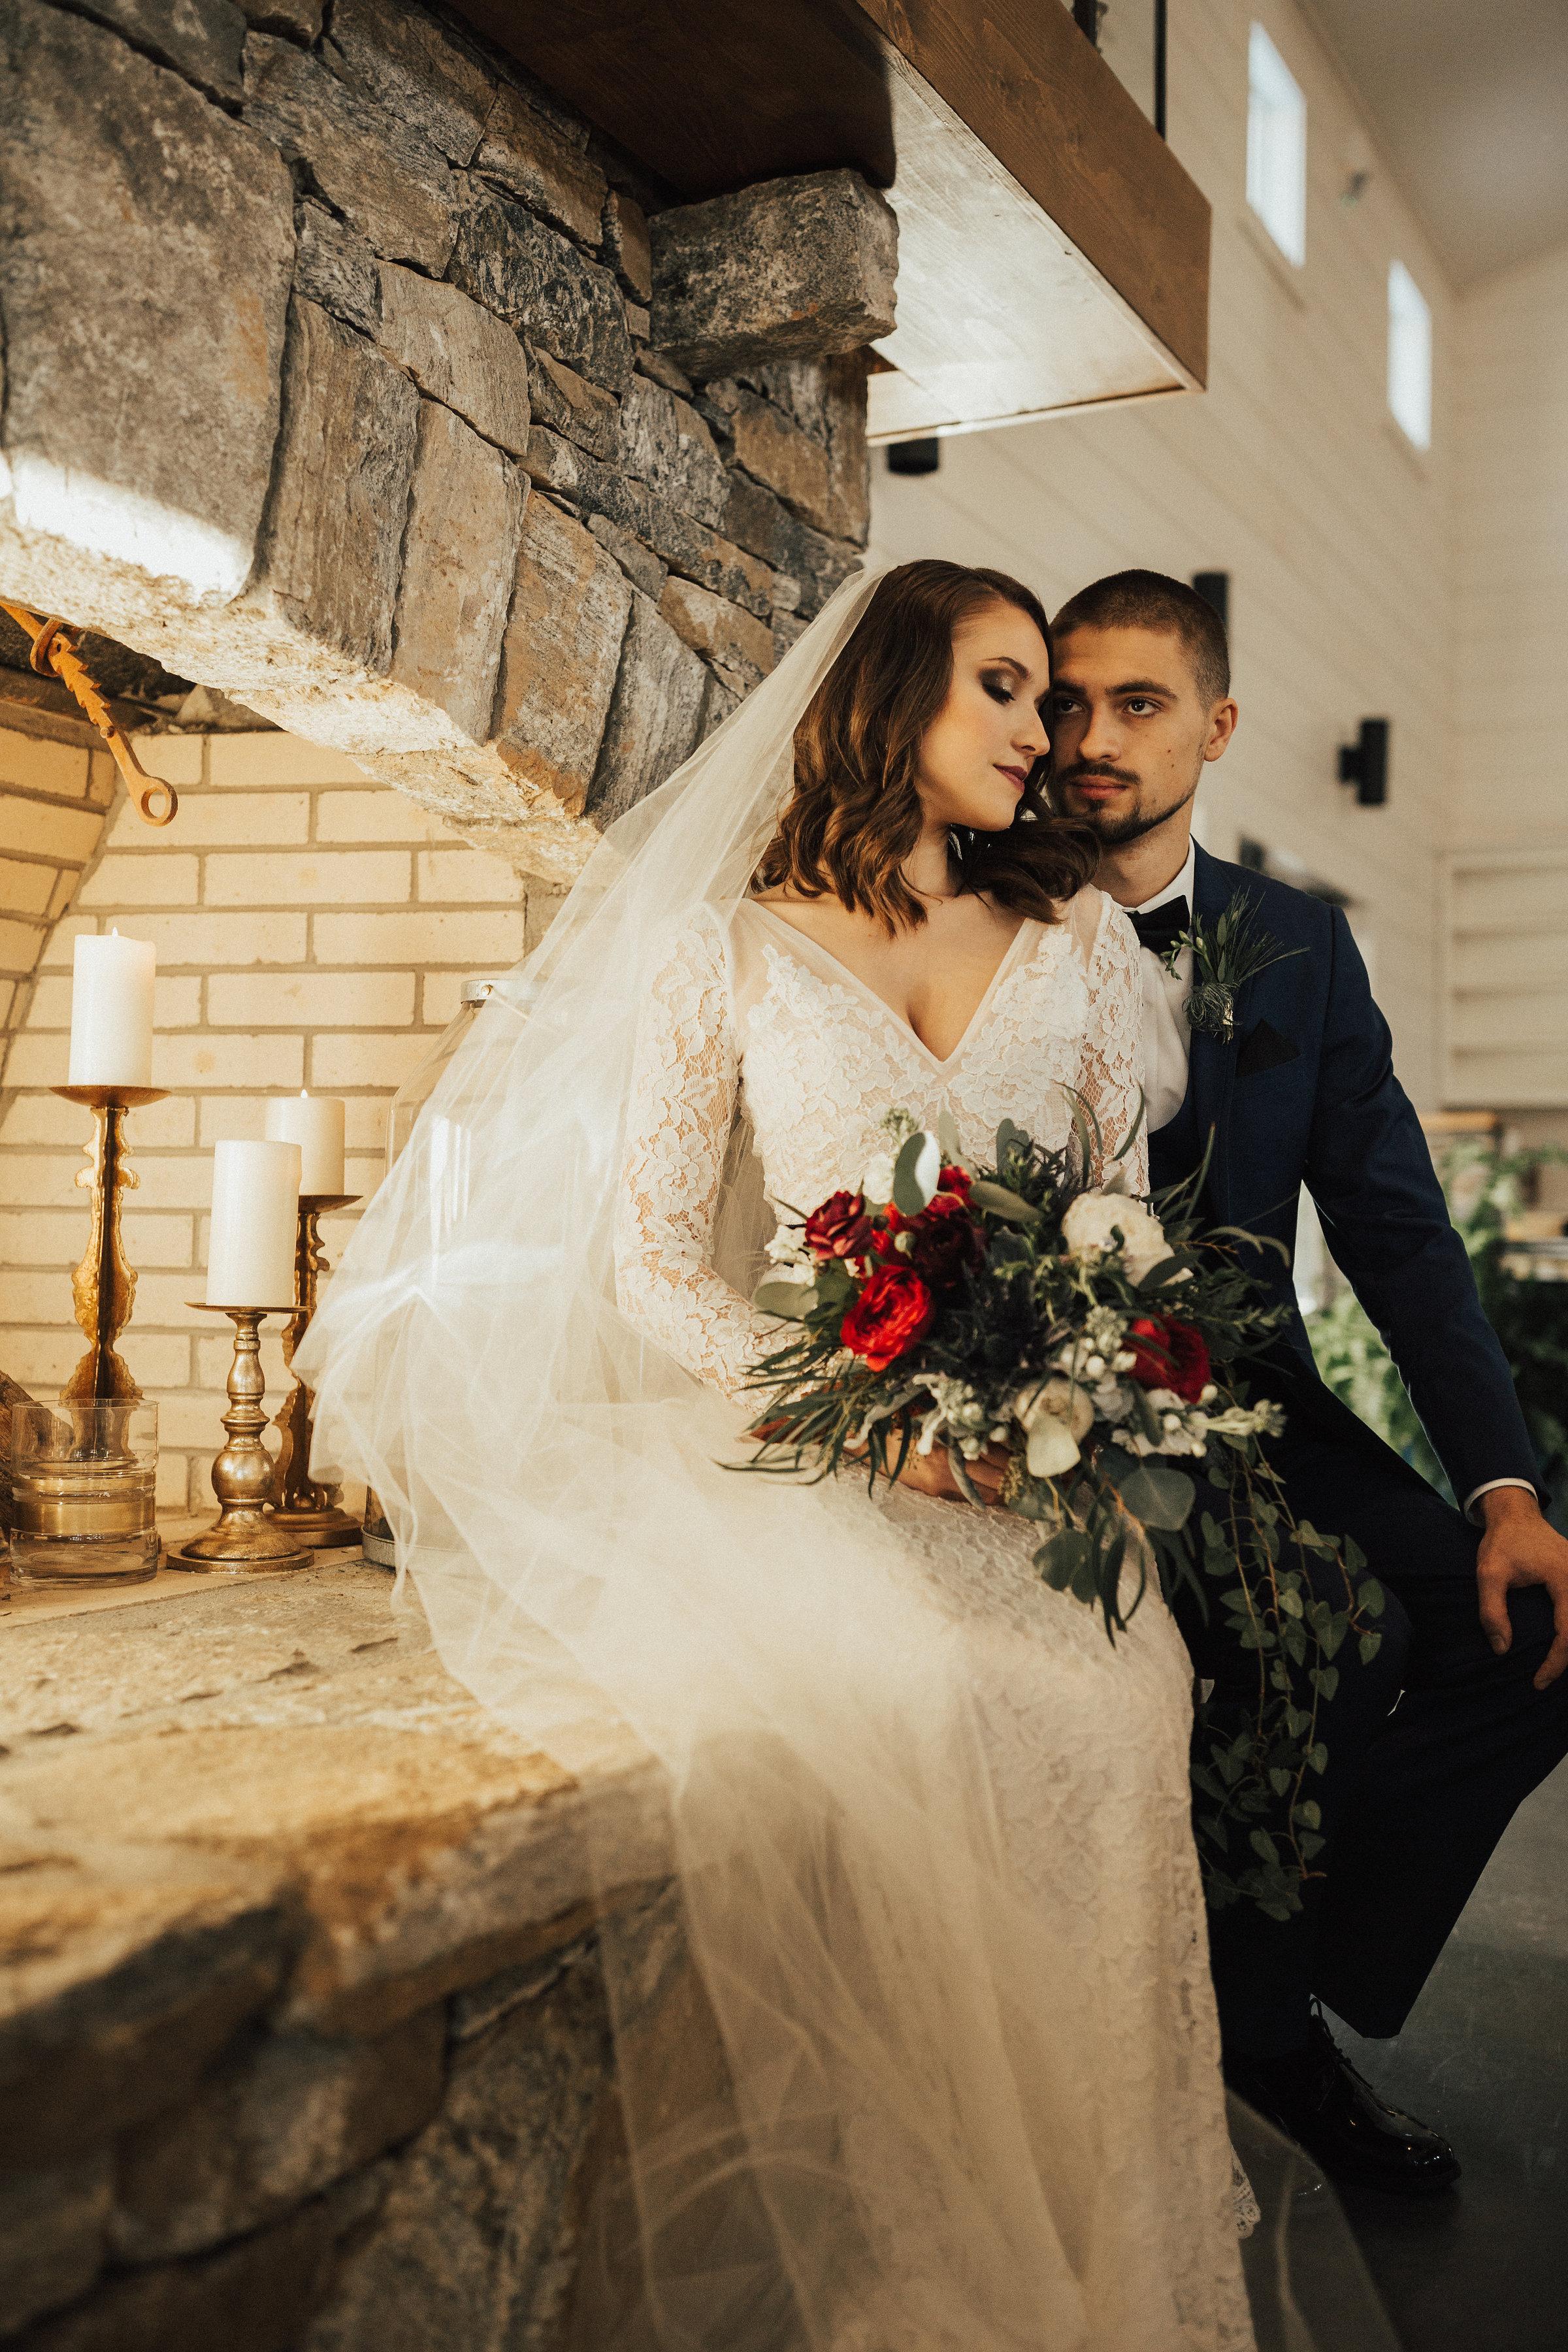 Joy-Unscripted-Wedding-Styled-Shoot-Celestial-Winter-46.jpg